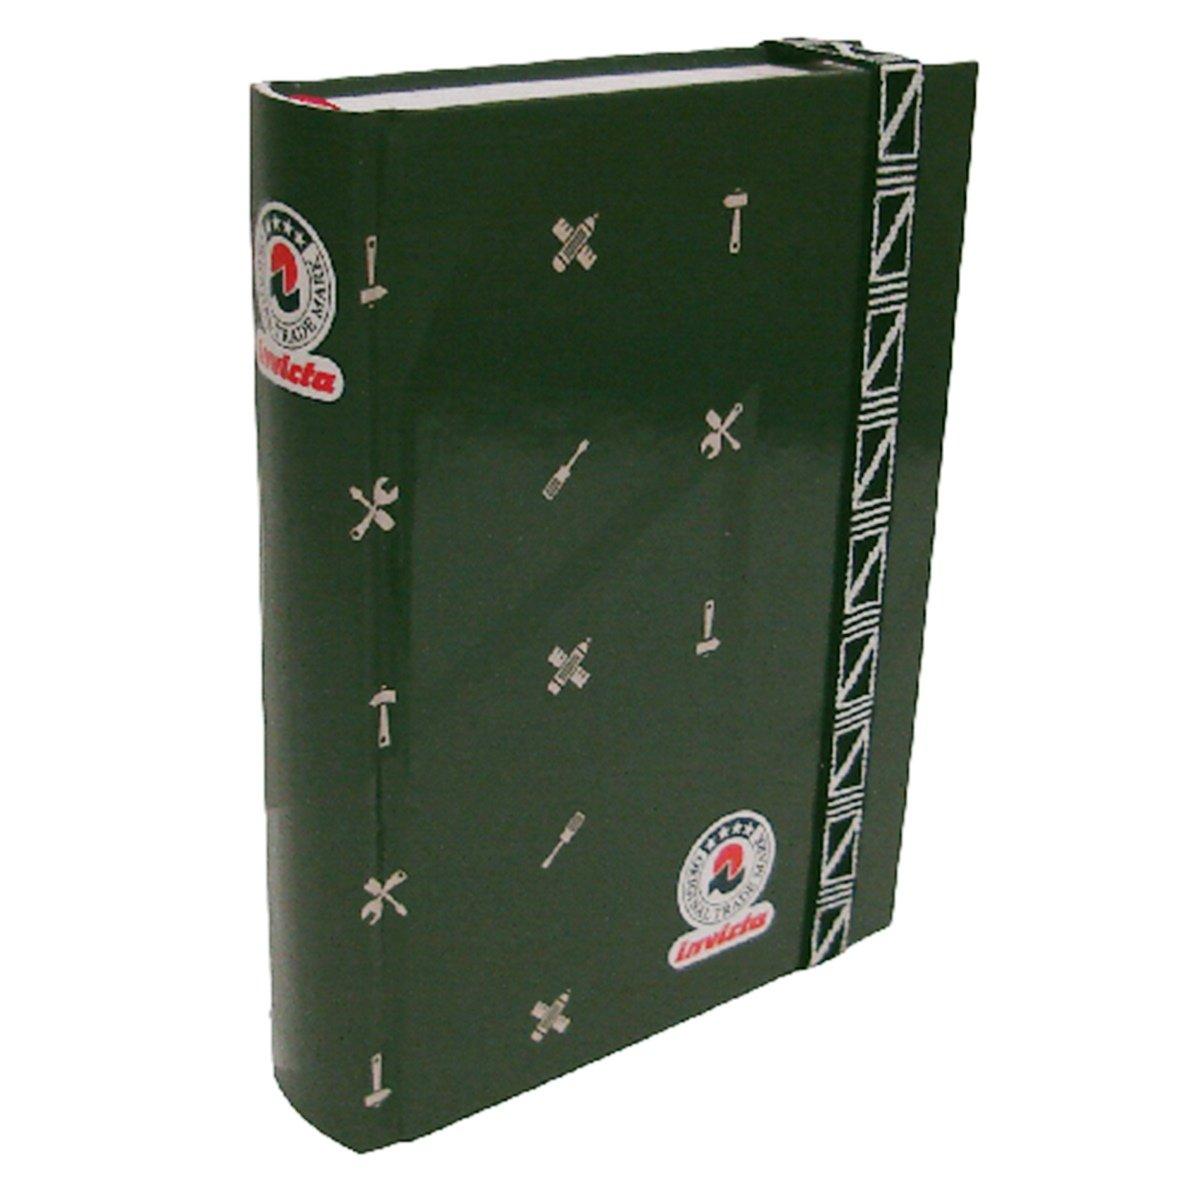 Invicta Diario Pocket 16 Mesi Con Elastico (Verde)